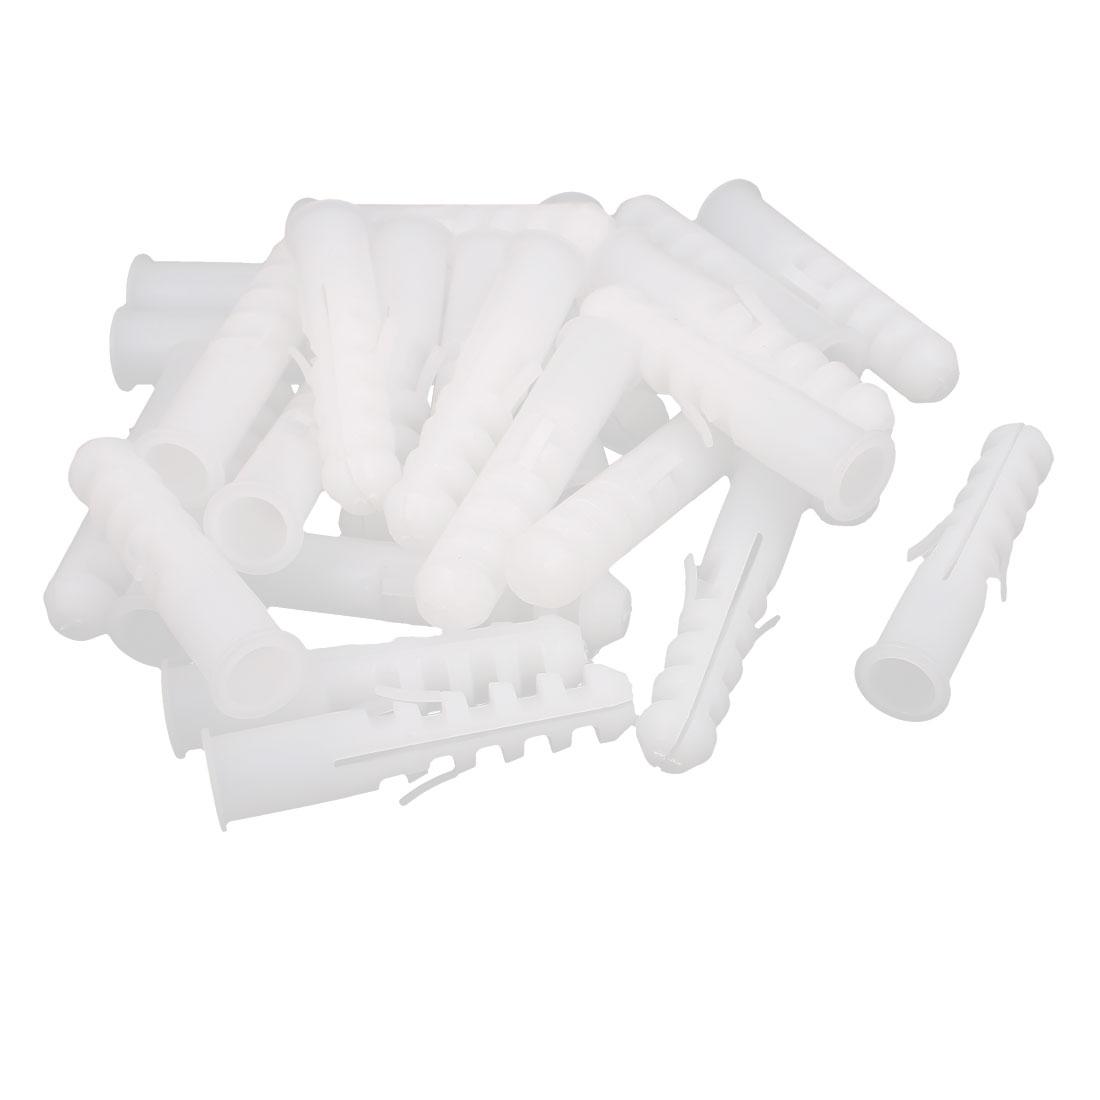 Cabinet Plastic Lag Screws Anchor Expansion Nails White 9mm Dia 26 Pcs